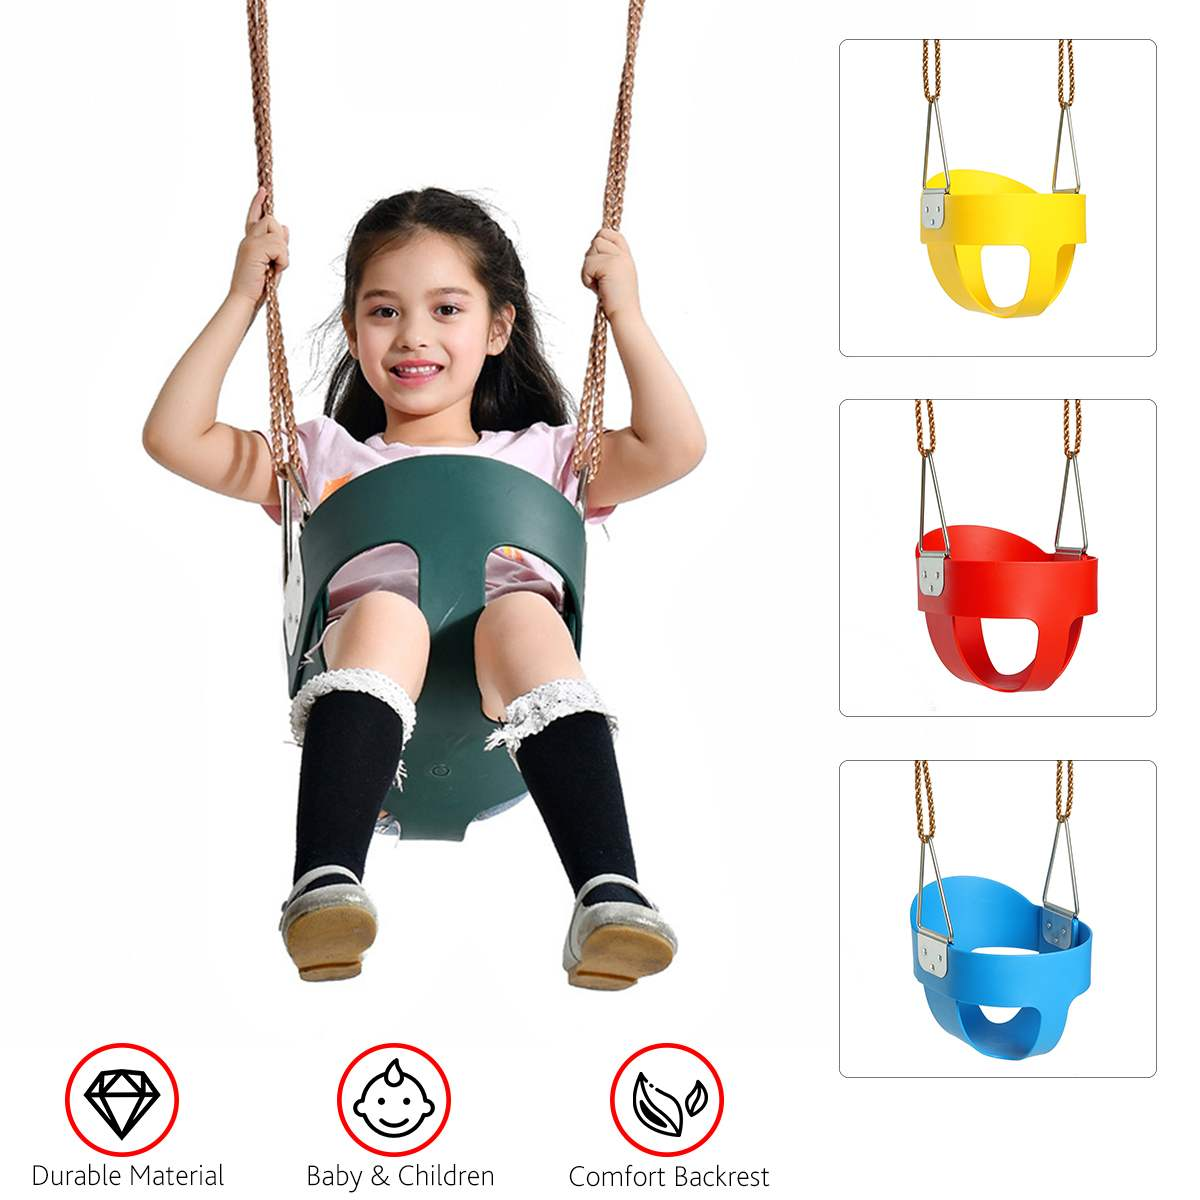 Altalena per bambini Set con accessori corda Outdoor Indoor Outdoor Garden